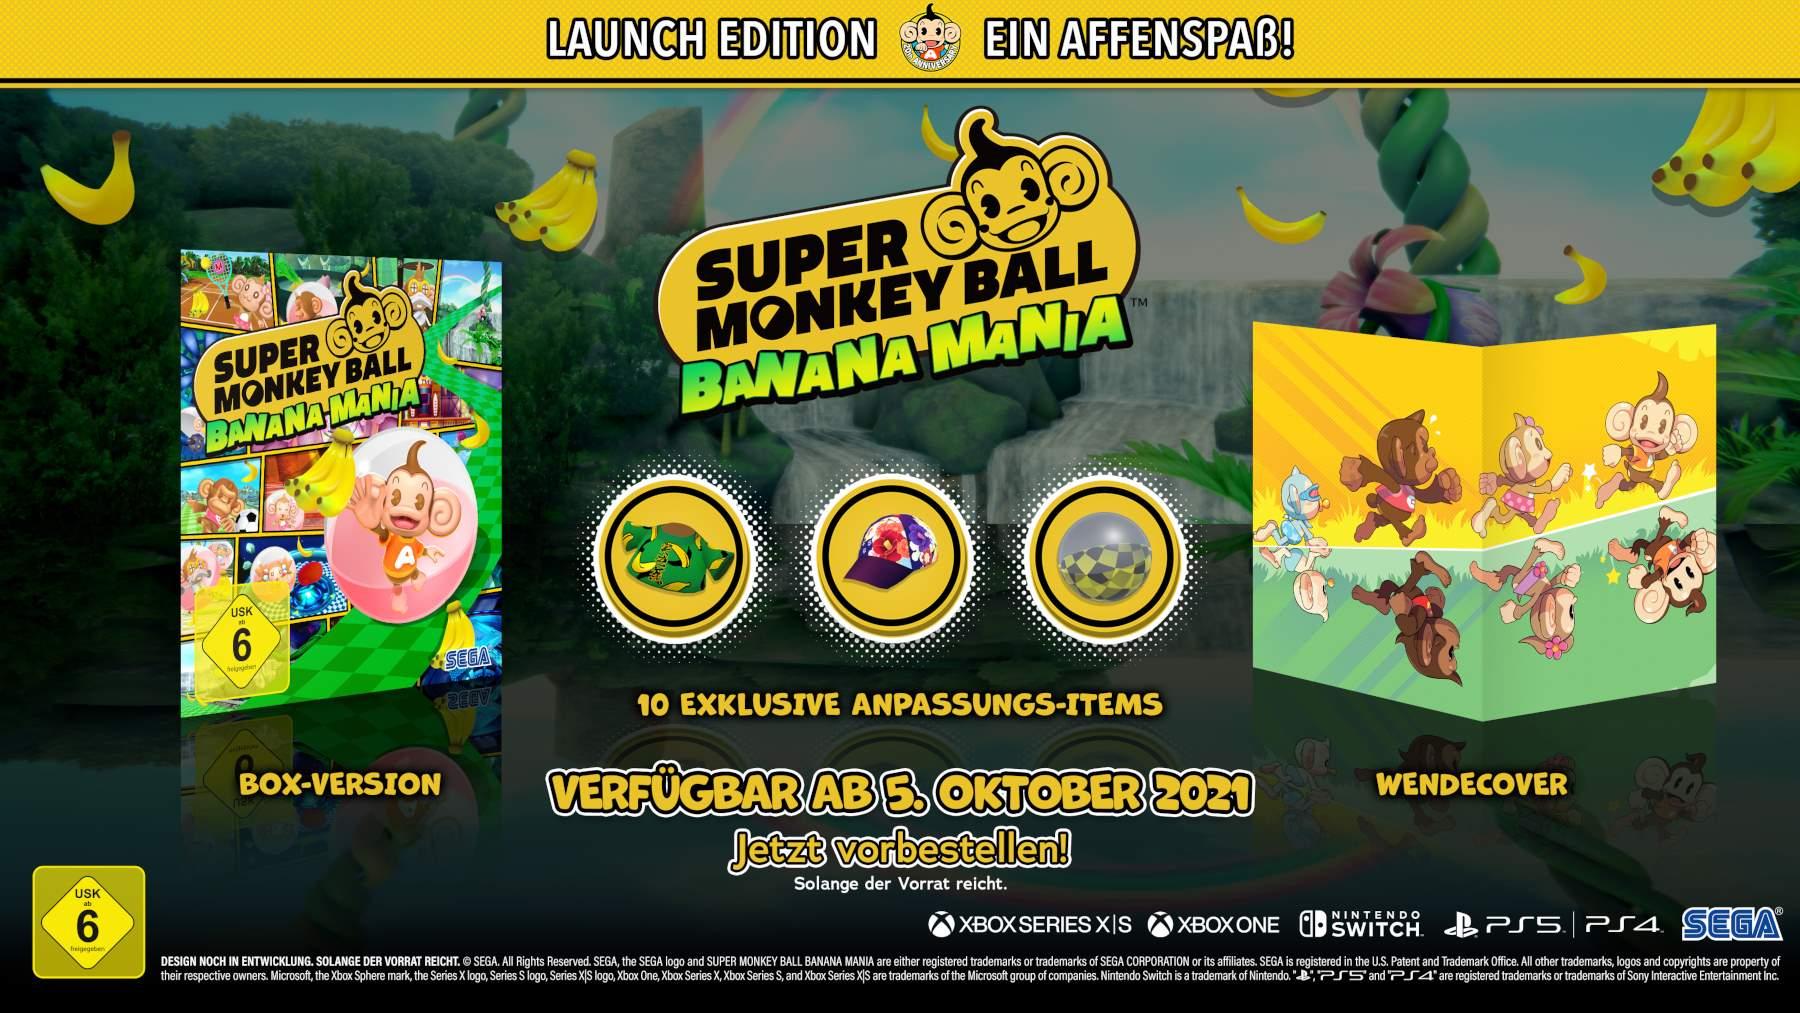 Super Monkey Ball Banana Mania Launch Edition